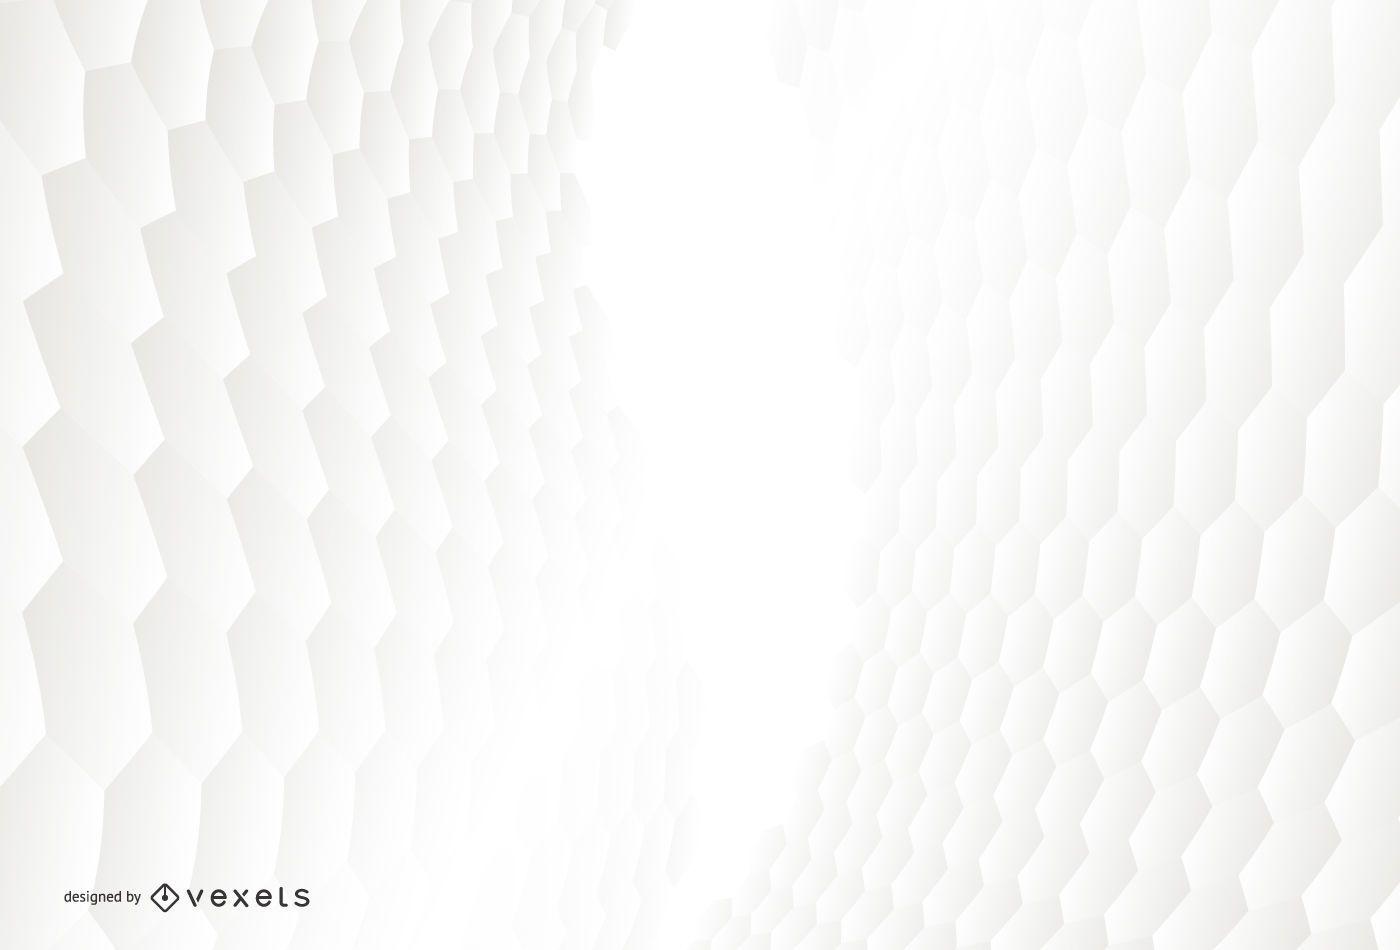 Fundo branco texturizado